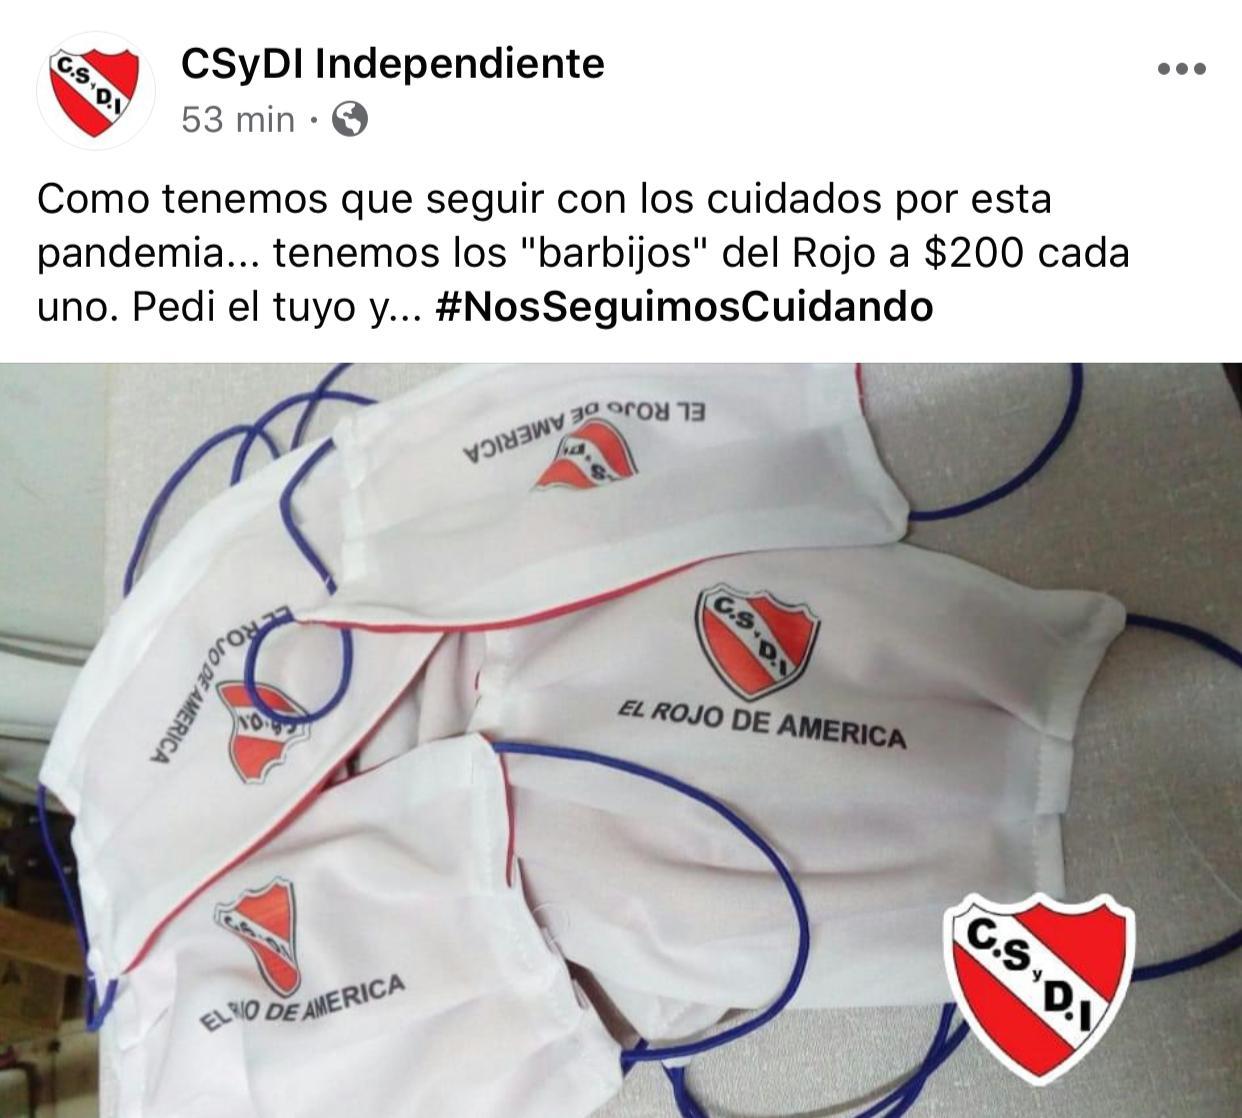 https://futboldeloeste.com.ar/wp-content/uploads/2020/04/1-8.jpg